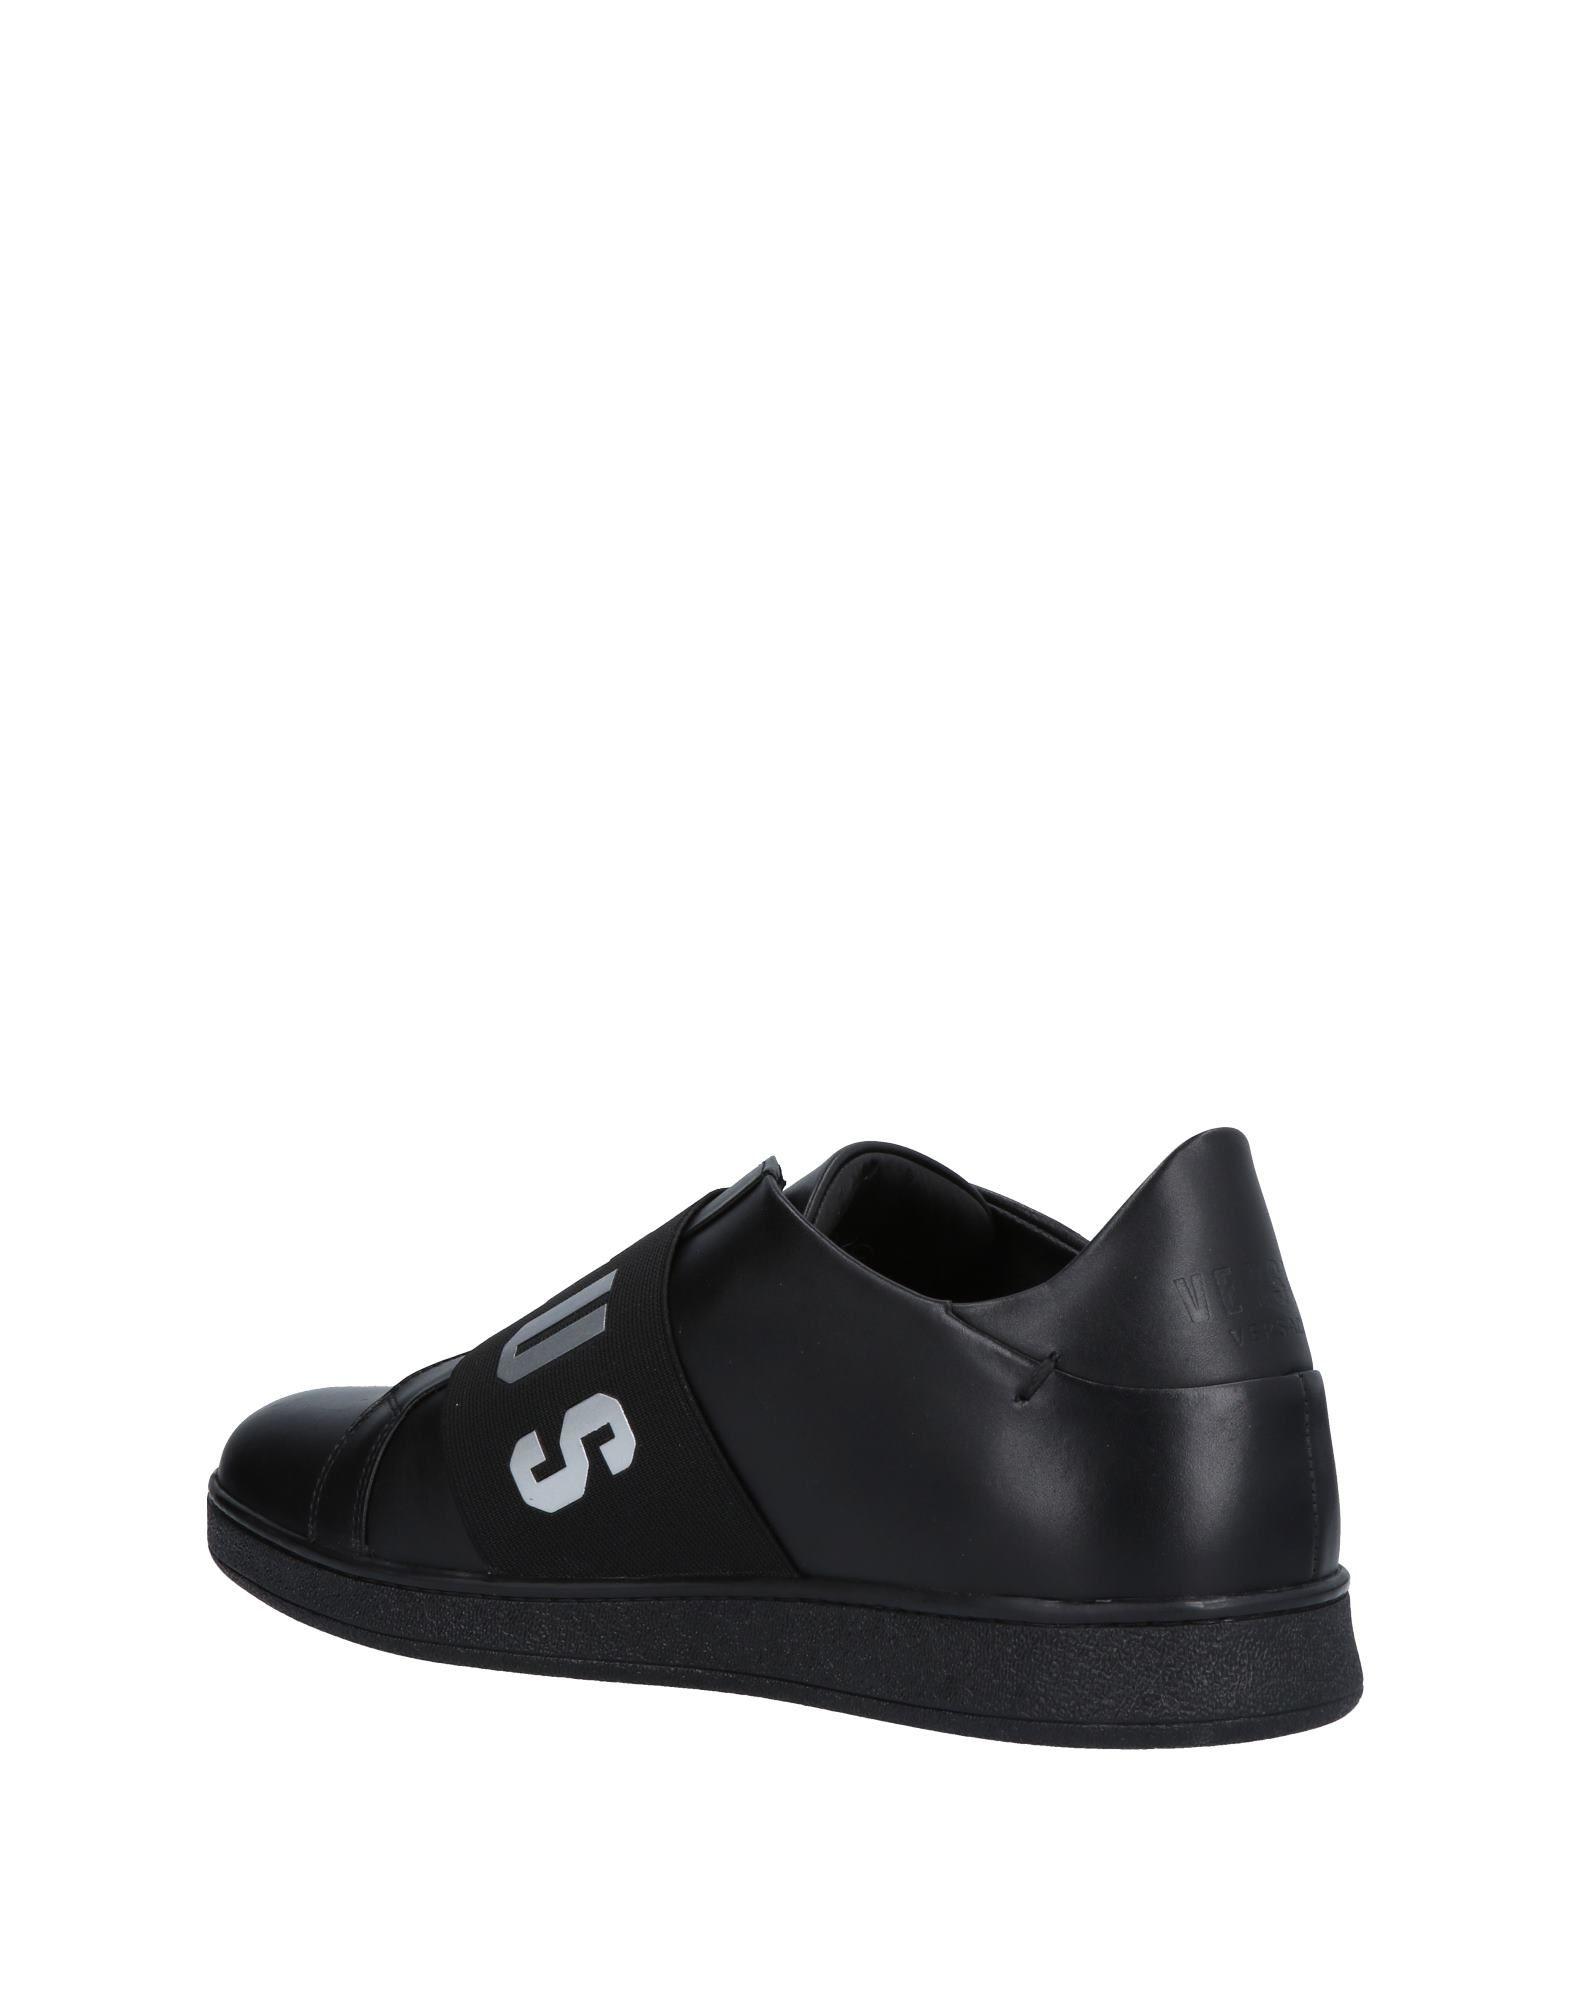 Sneakers Versus Versace Femme - Sneakers Versus Versace sur